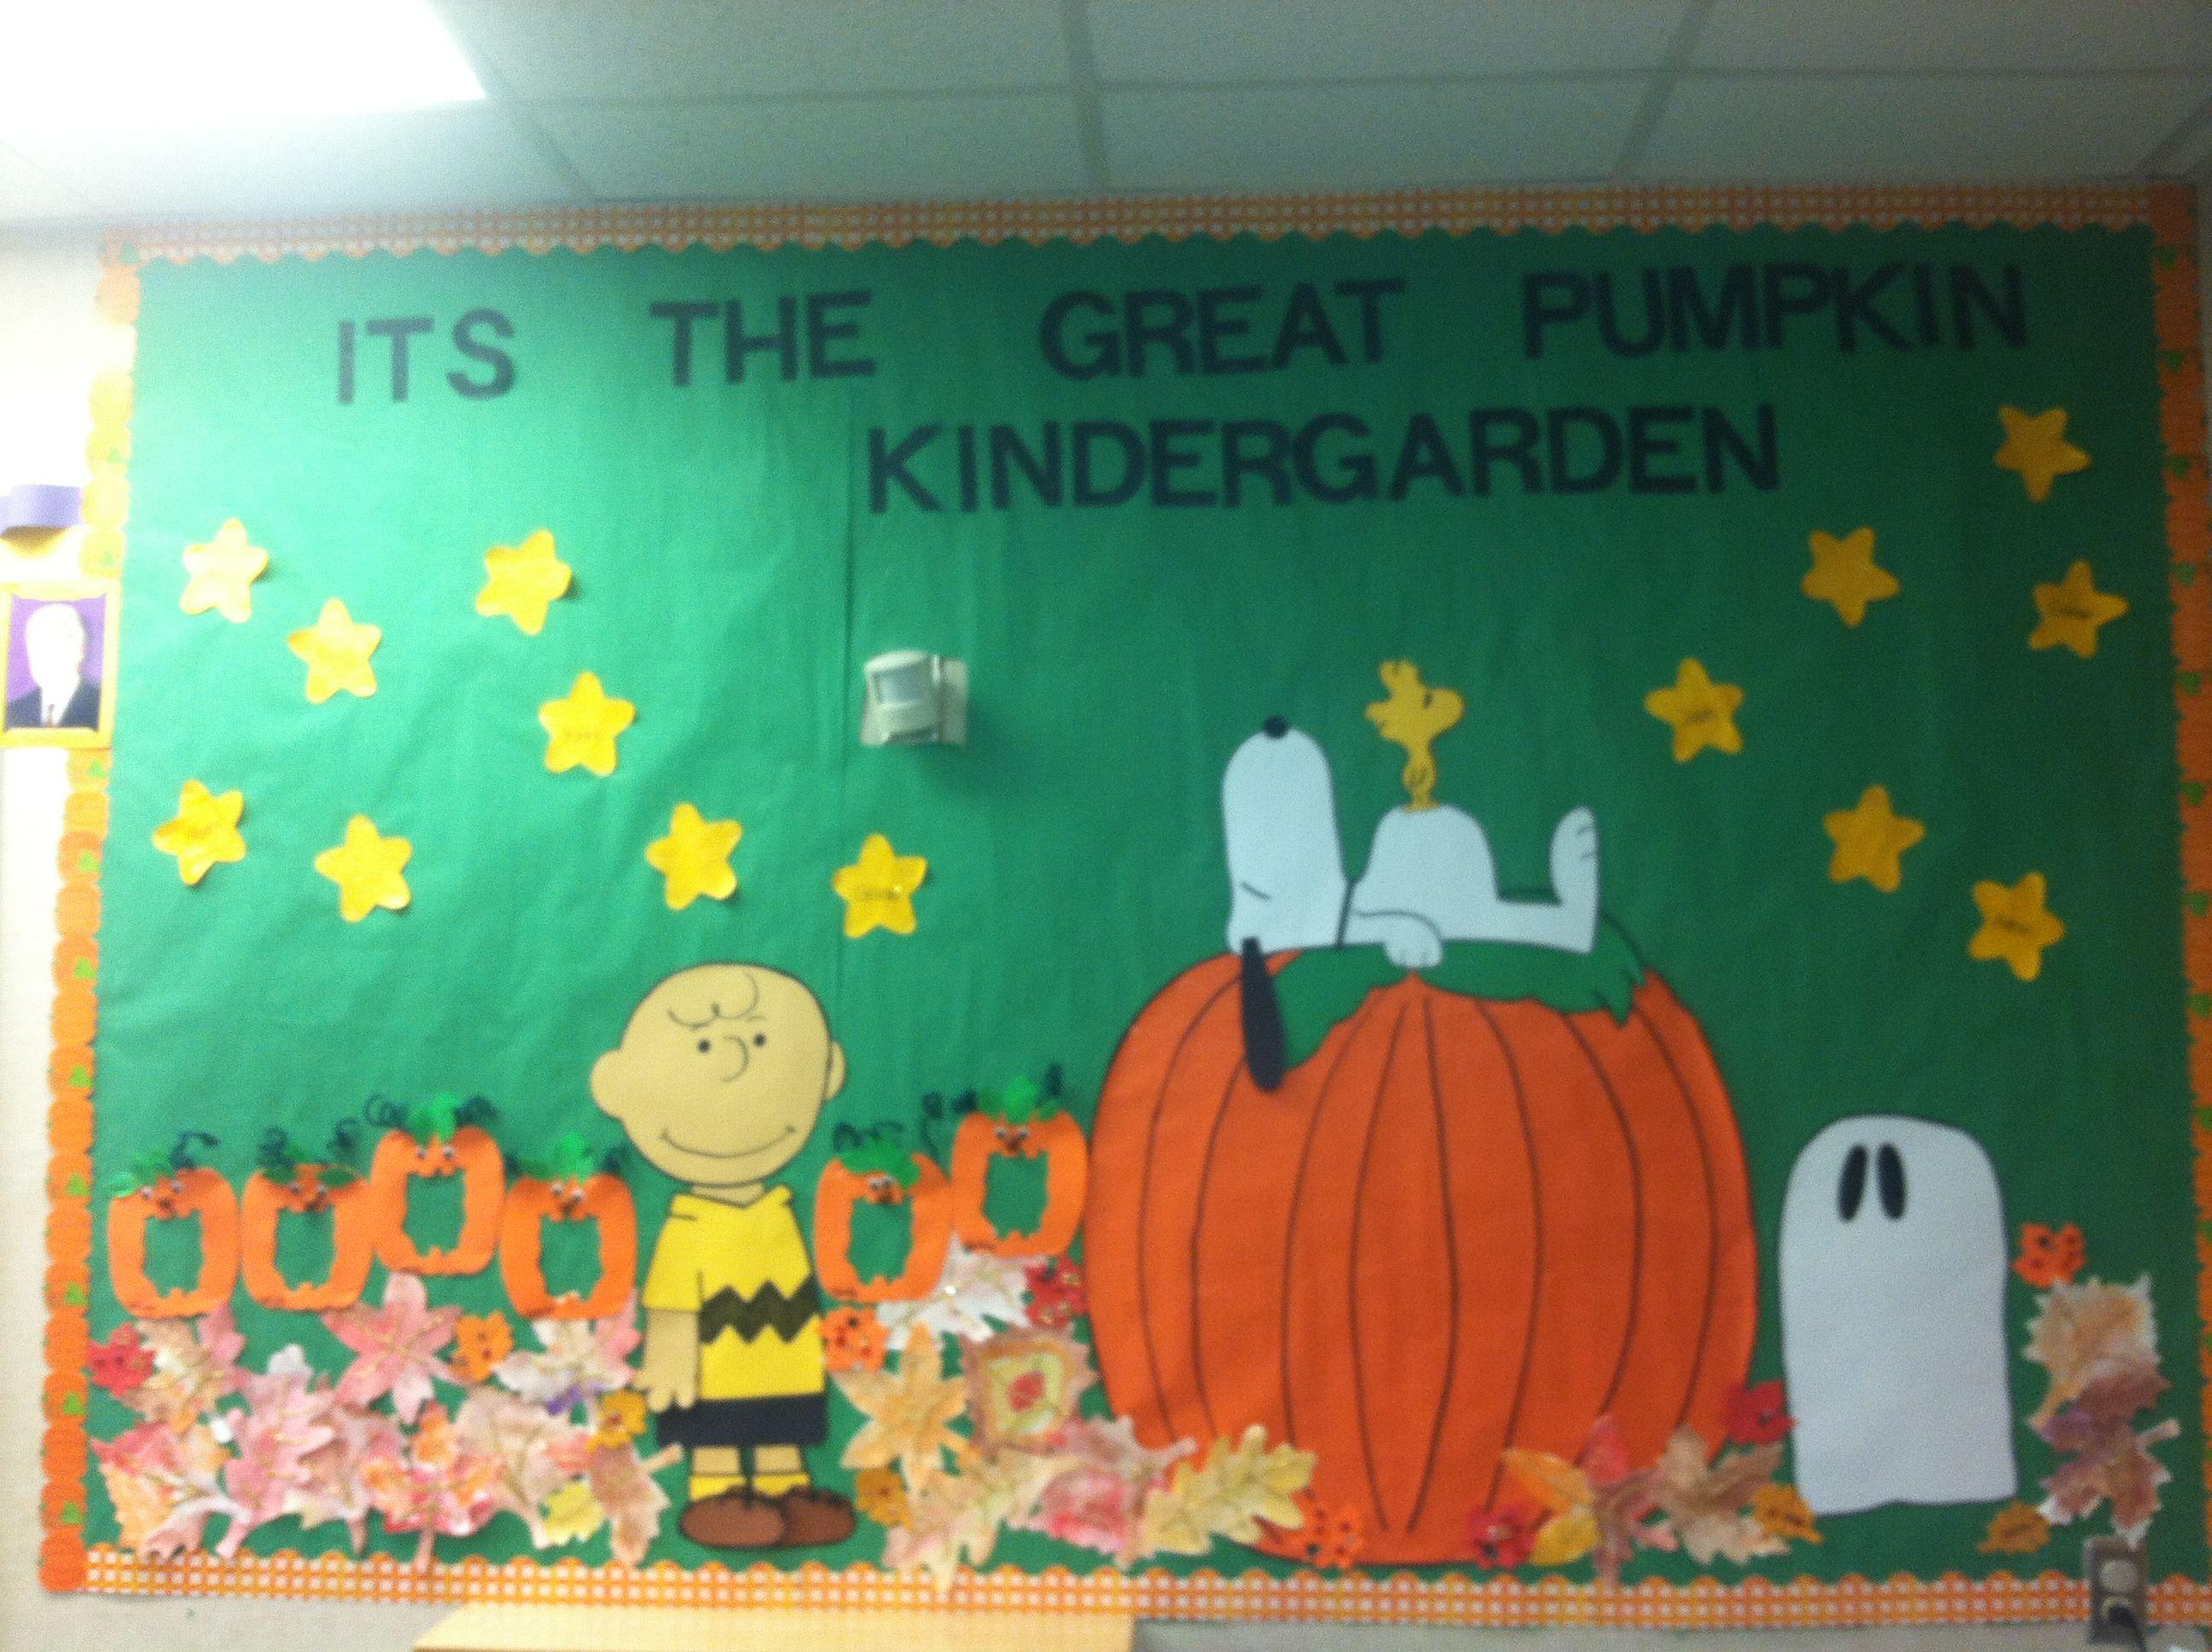 The great pumpkin board